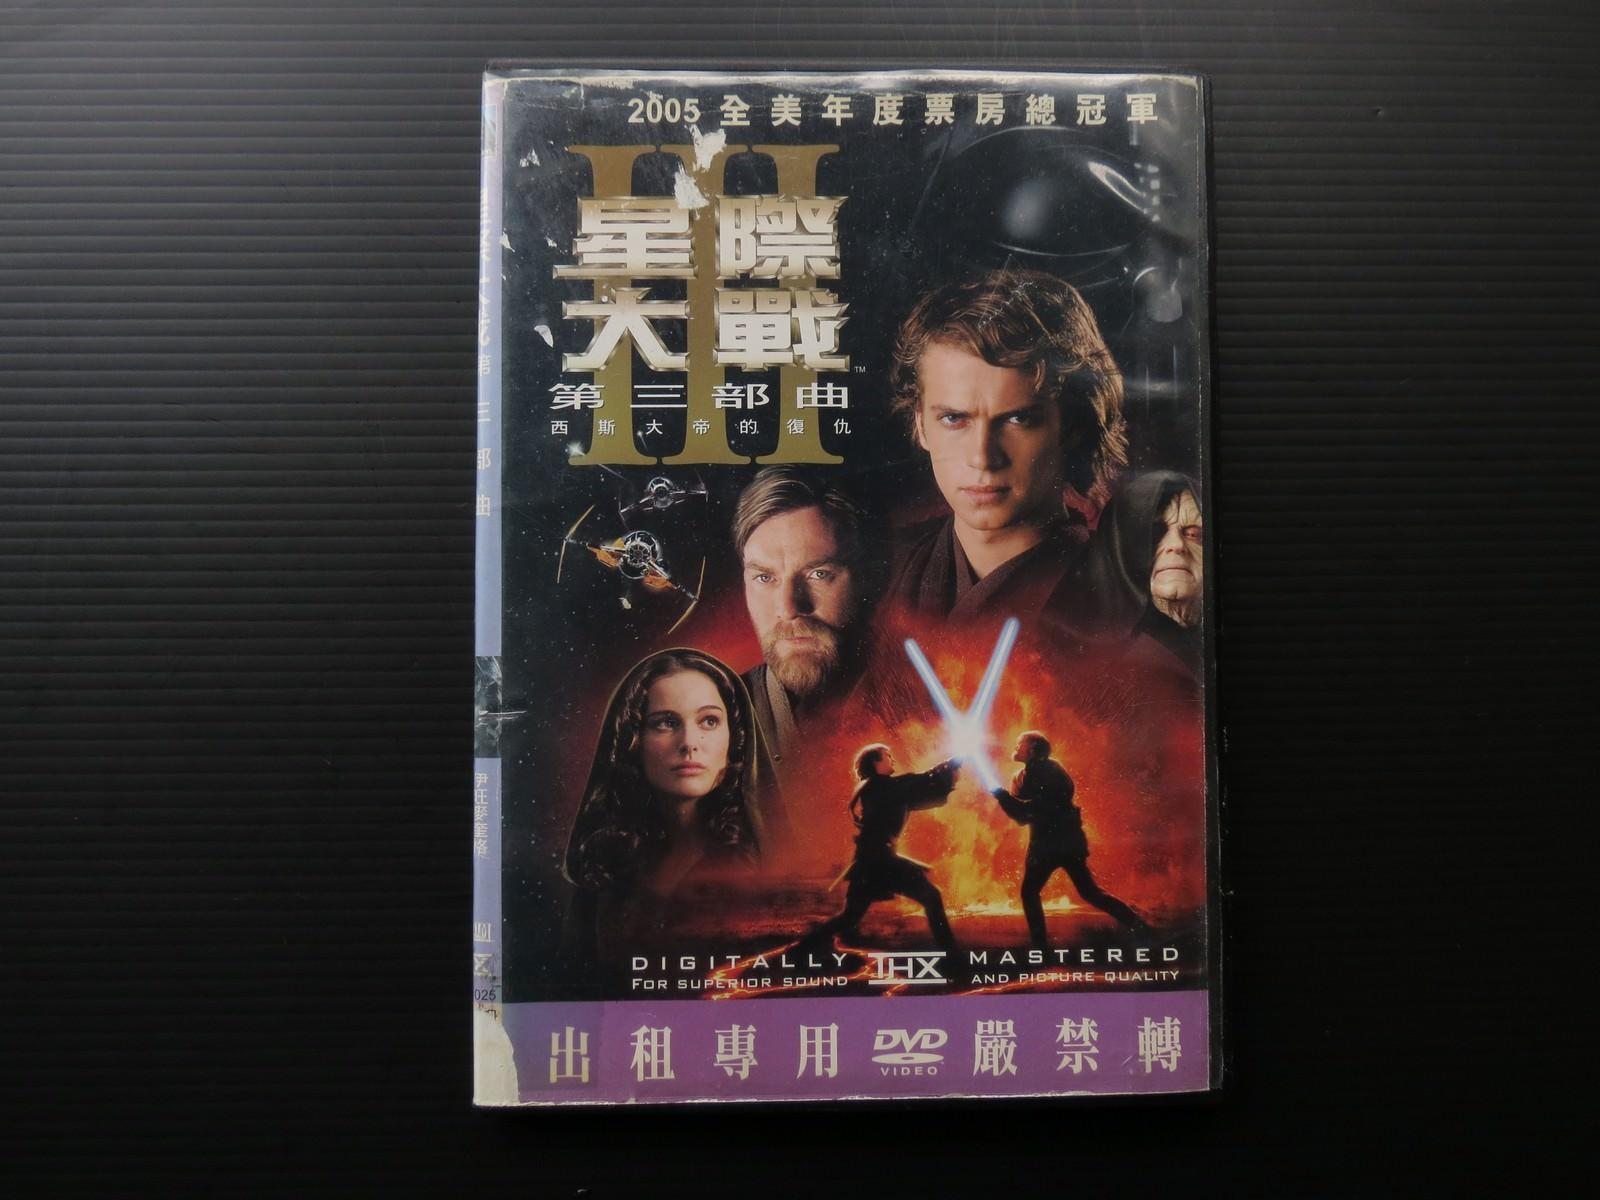 Movie, Star Wars Episode III: Revenge of the Sith(美國, 2005) / 星際大戰三部曲:西斯大帝的復仇(台灣) / 星球大战前传:西斯的复仇(中國) / 星球大戰前傳:黑帝君臨(香港), 電影DVD